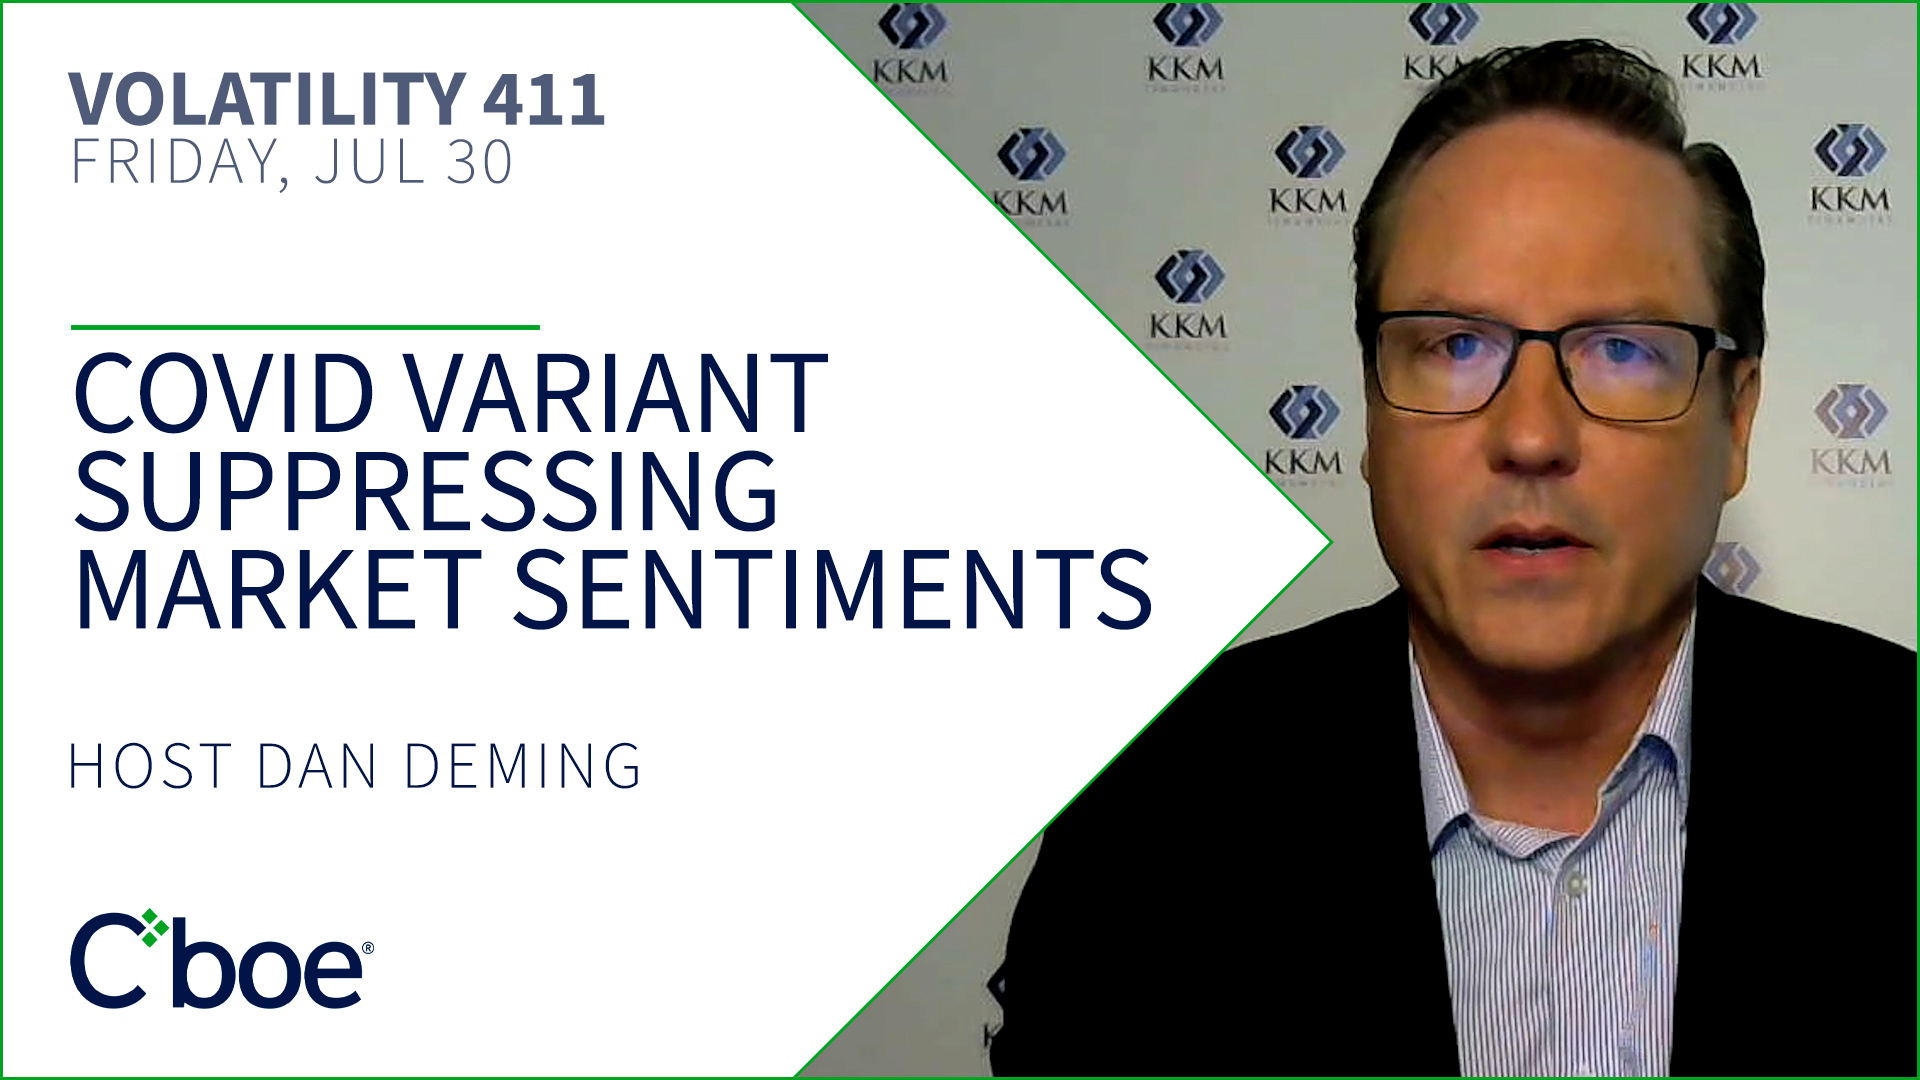 Covid Variant Suppressing Market Sentiments Thumbnail